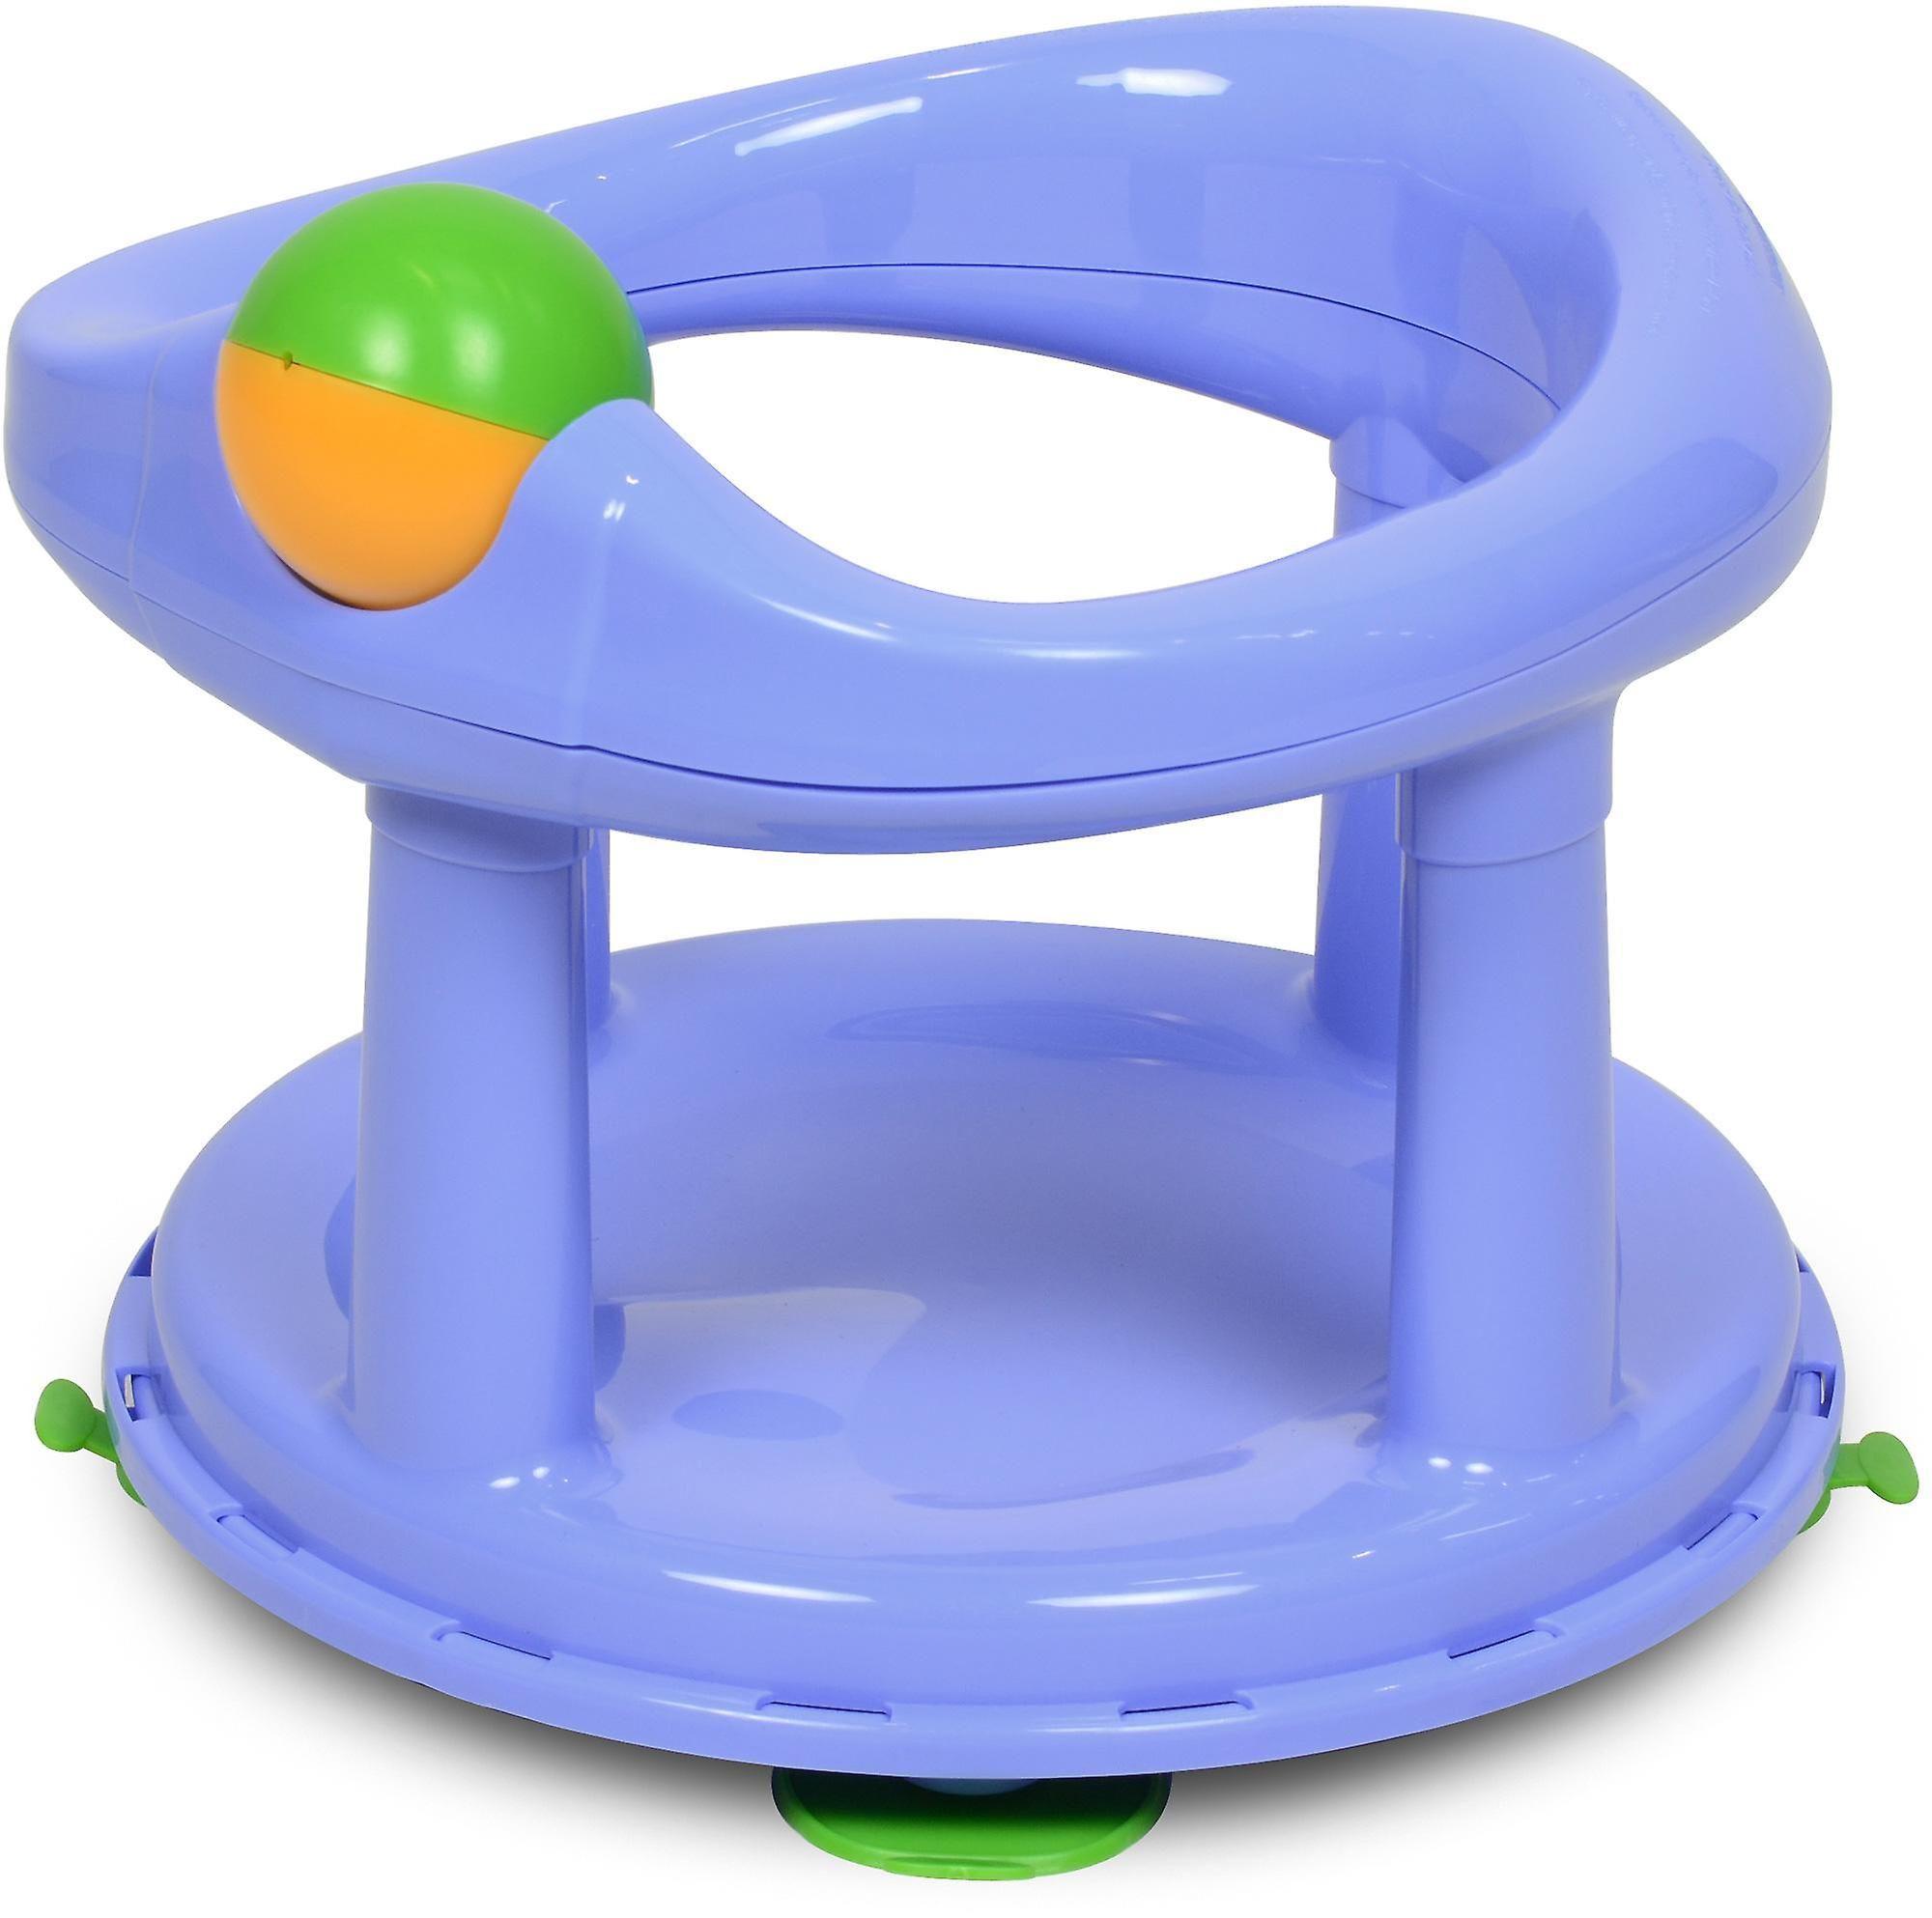 Safety 1st Swivel Bath Seat - Pastel Blue | Baby Brown | Pinterest ...